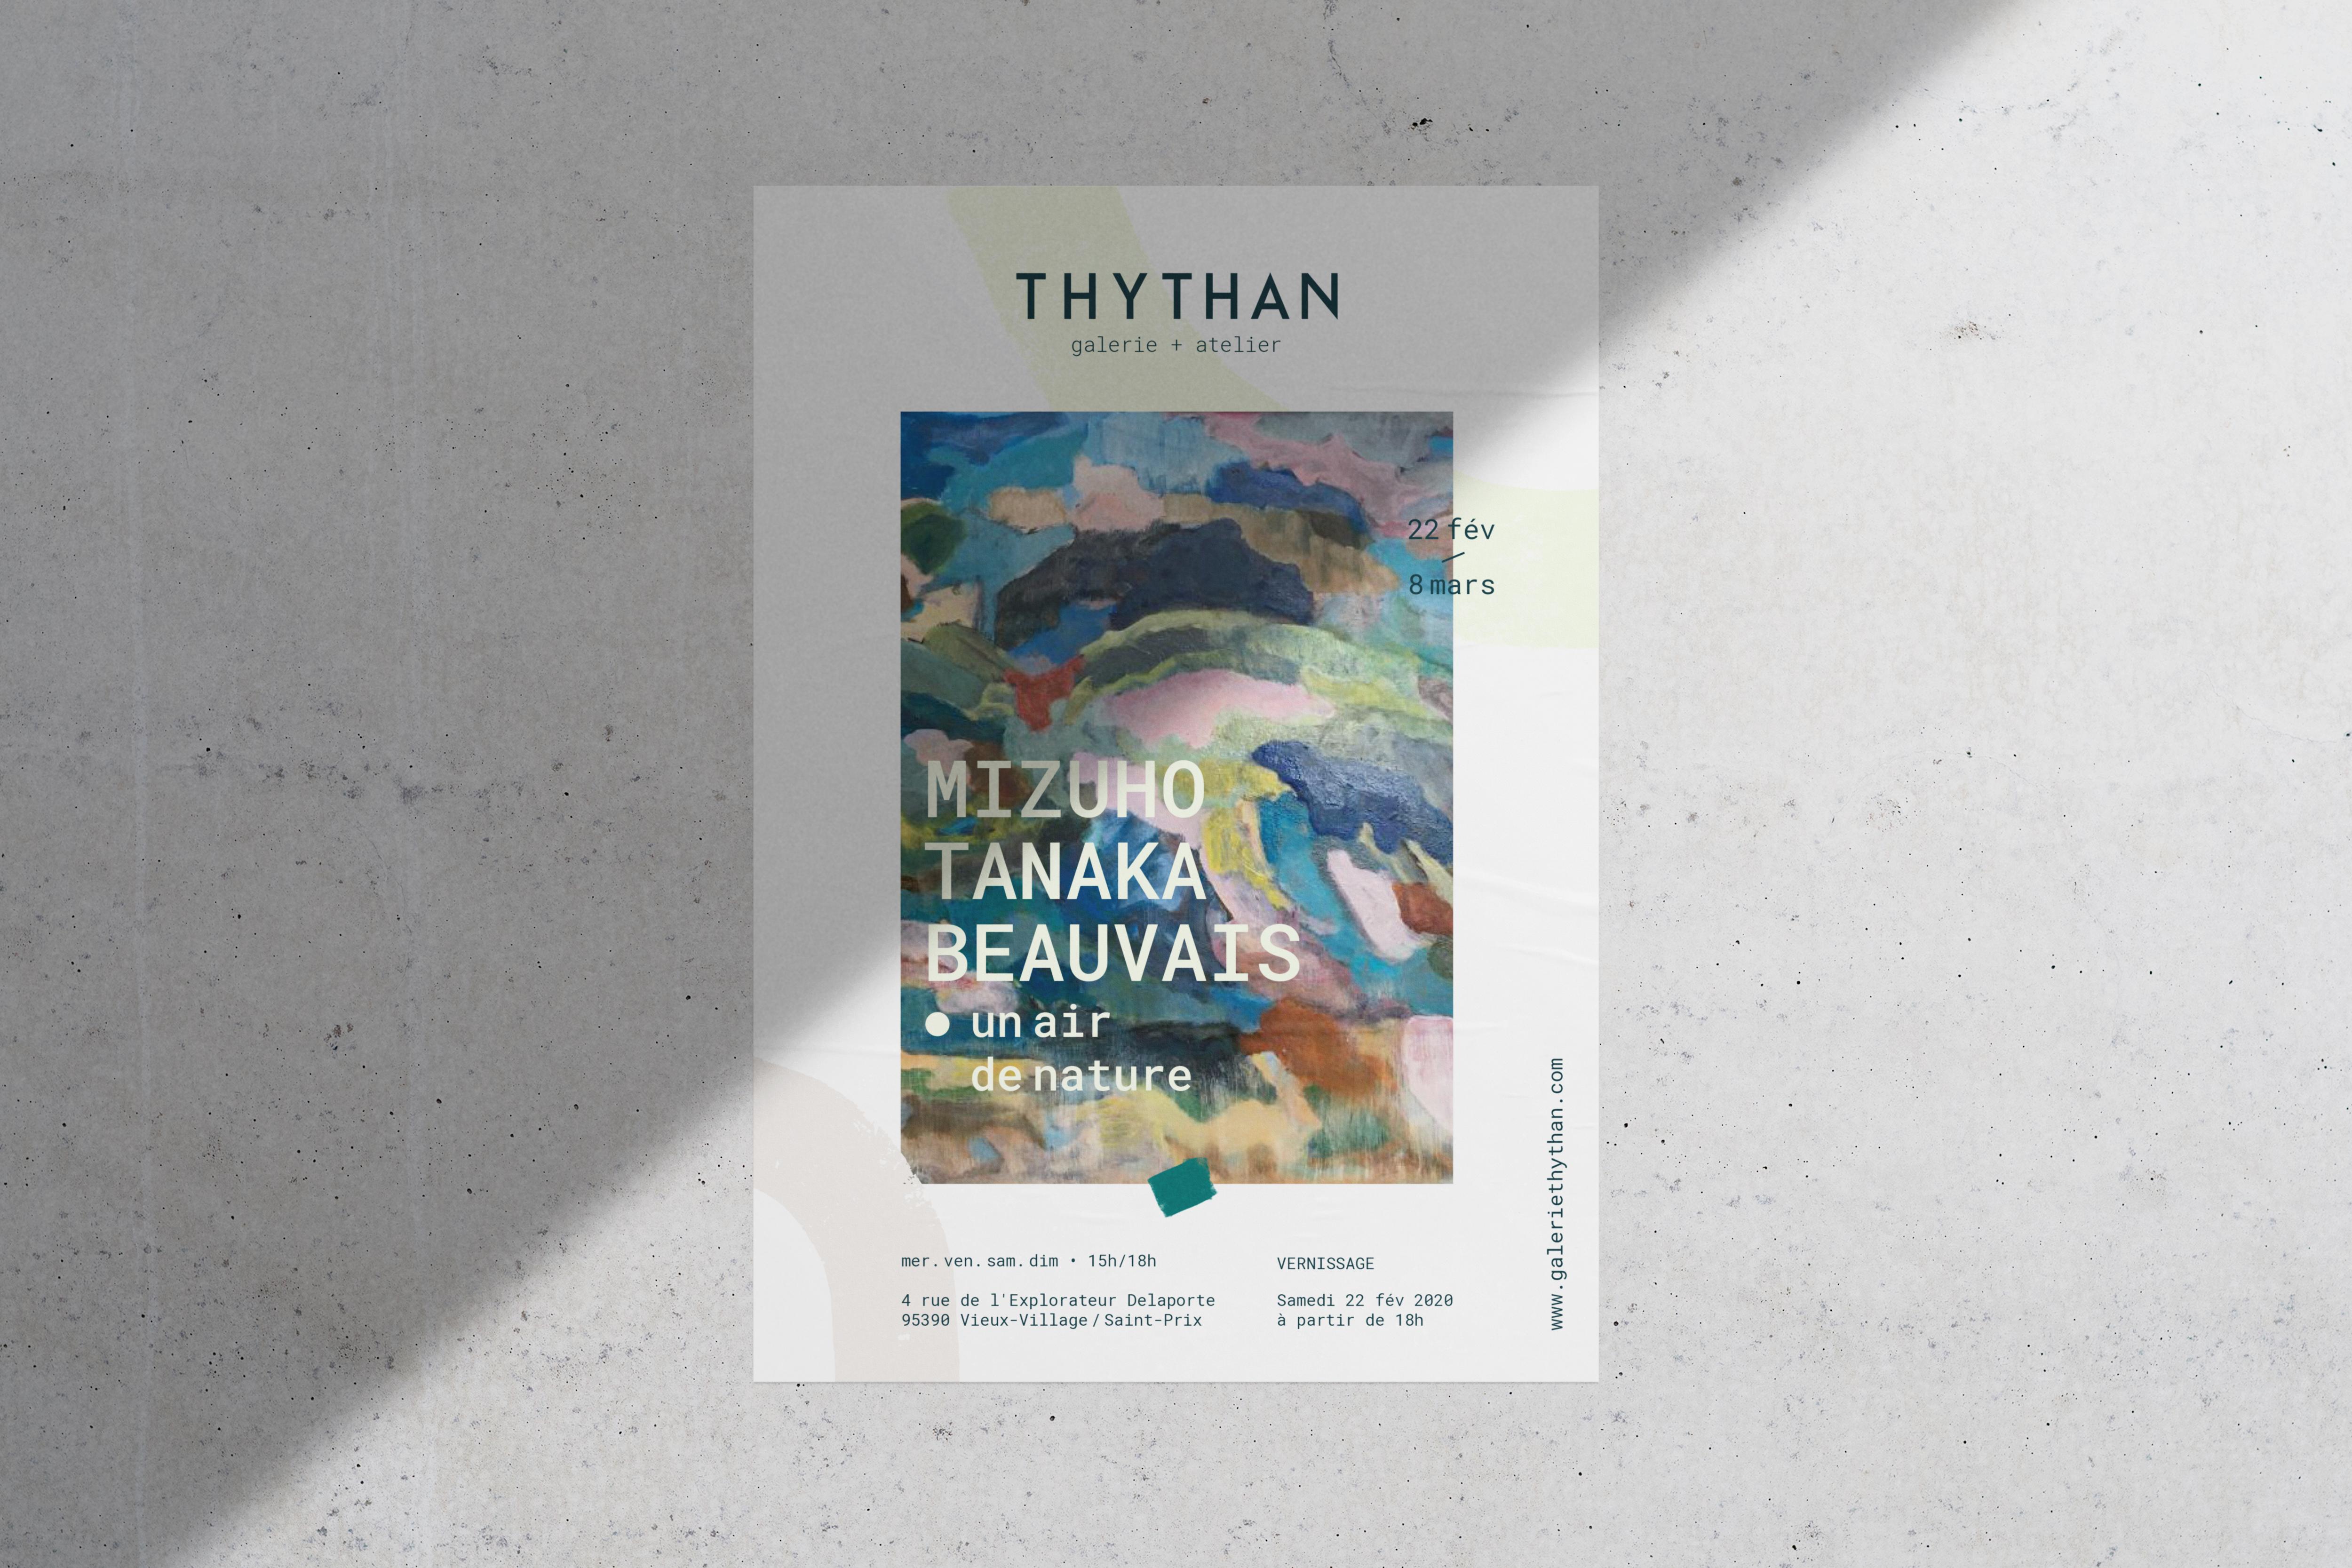 exposition-thythan-studiodoux